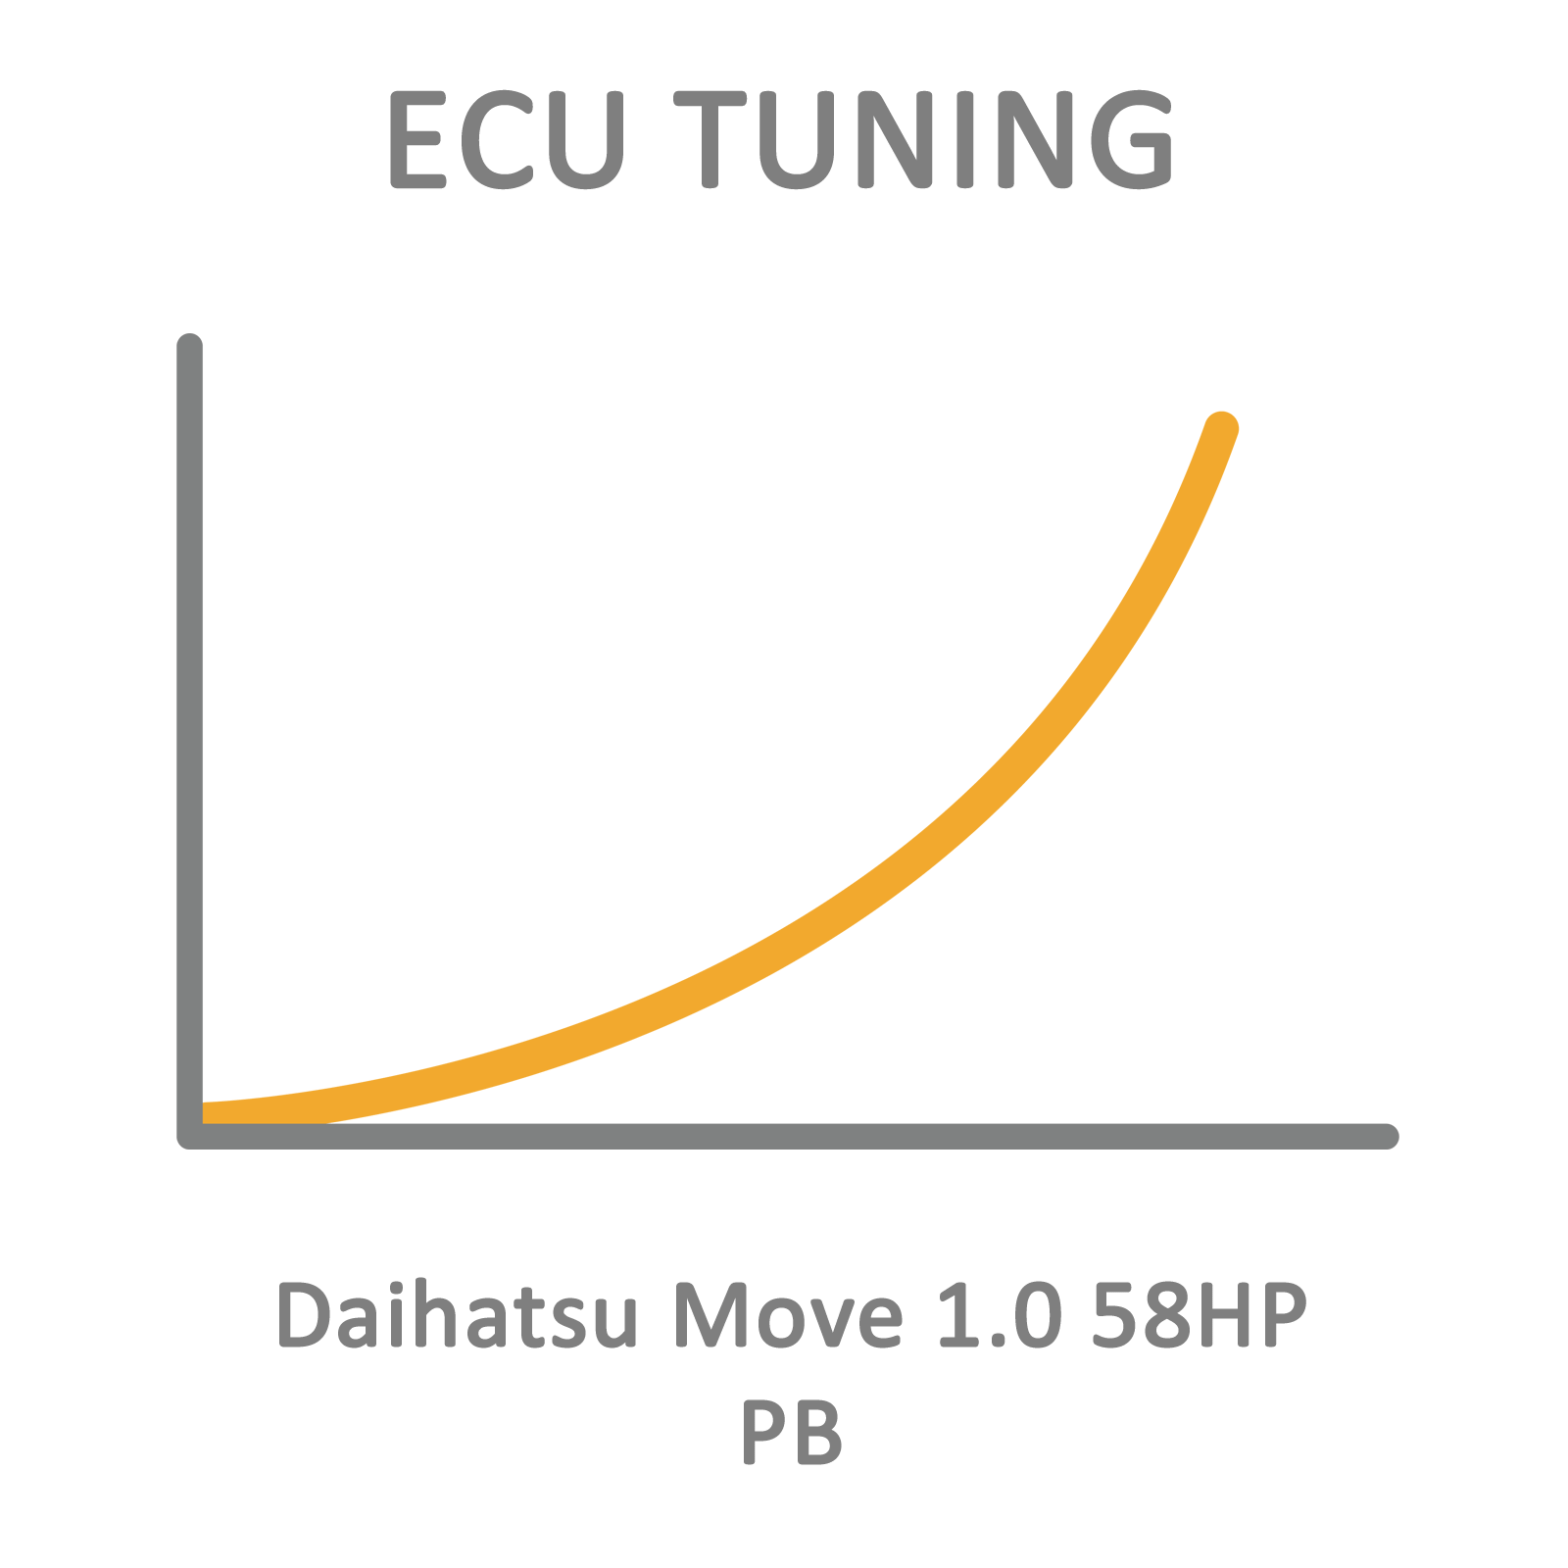 Daihatsu Move 1.0 58HP PB ECU Tuning Remapping Programming